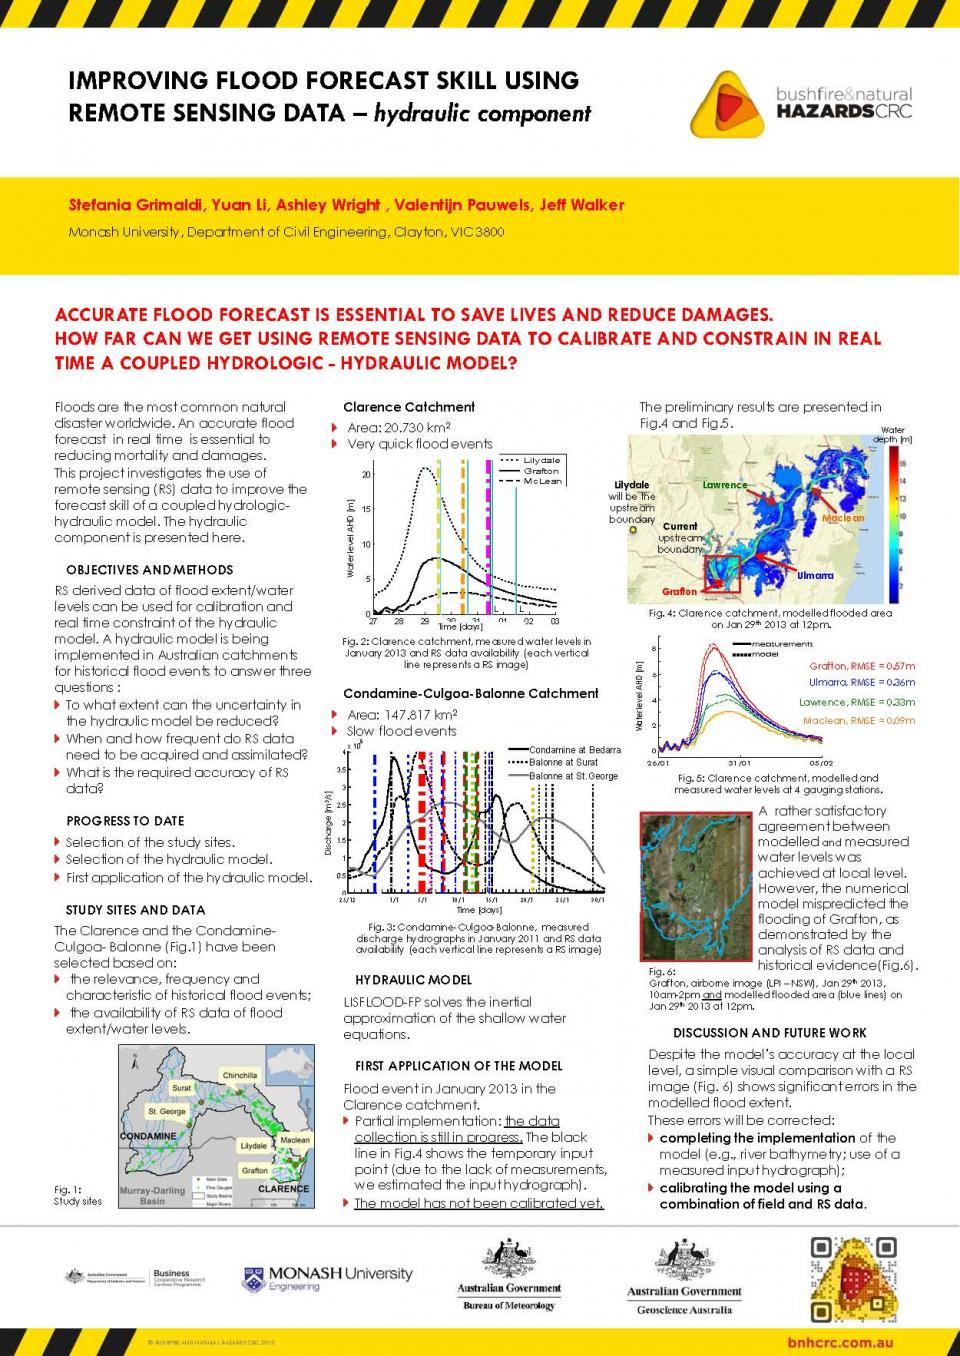 Improving Flood Forecast Skill Using Remote Sensing Data - Hydraulic Component